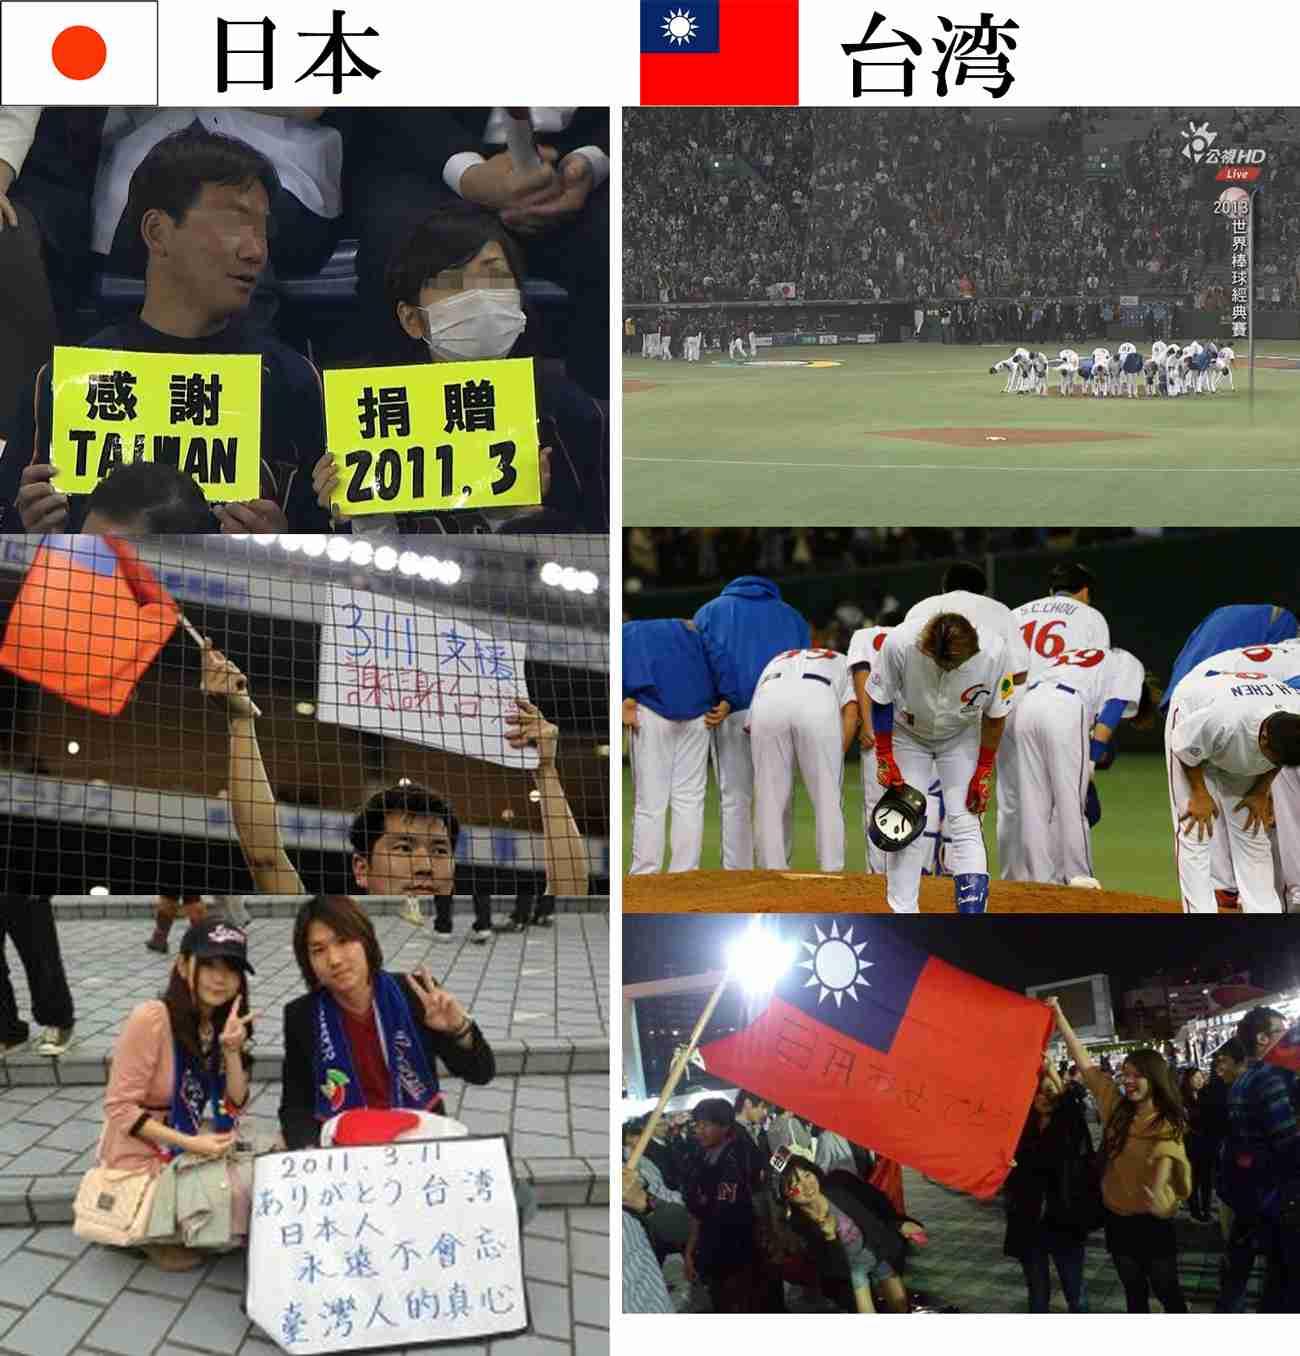 WBCで日本側スタンドに「謝謝台湾」 台湾SNSでは「感動した!」の声、日本も台湾チームと応援団に「称賛」の声、日本との死闘に敗れた台湾はキューバに負けWBC敗退、サムライジャパンは台湾の分まで頑張れ ( その他政界と政治活動 ) - 近野滋之Blog『民族主義者の警鐘』 - Yahoo!ブログ